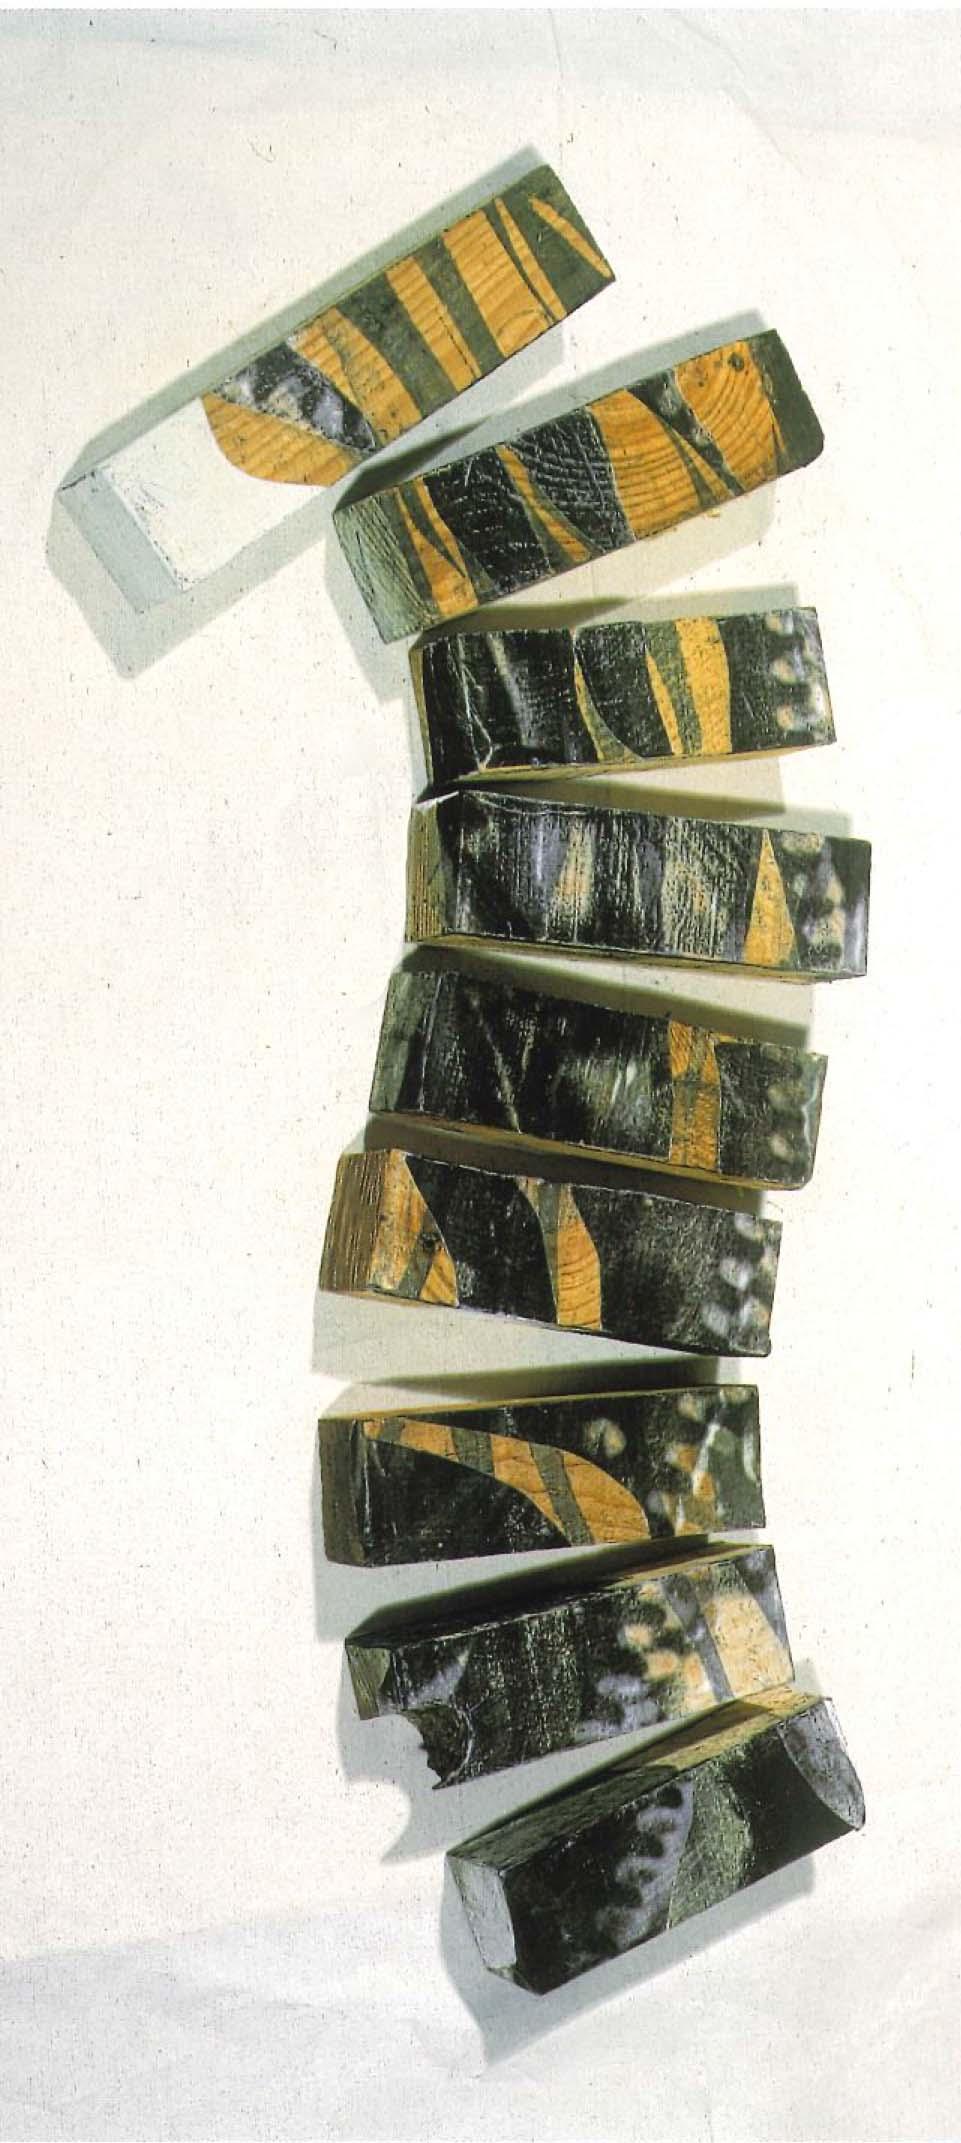 Engranajes II, 2000 collage s-madera 65 x 23 x 8 cm